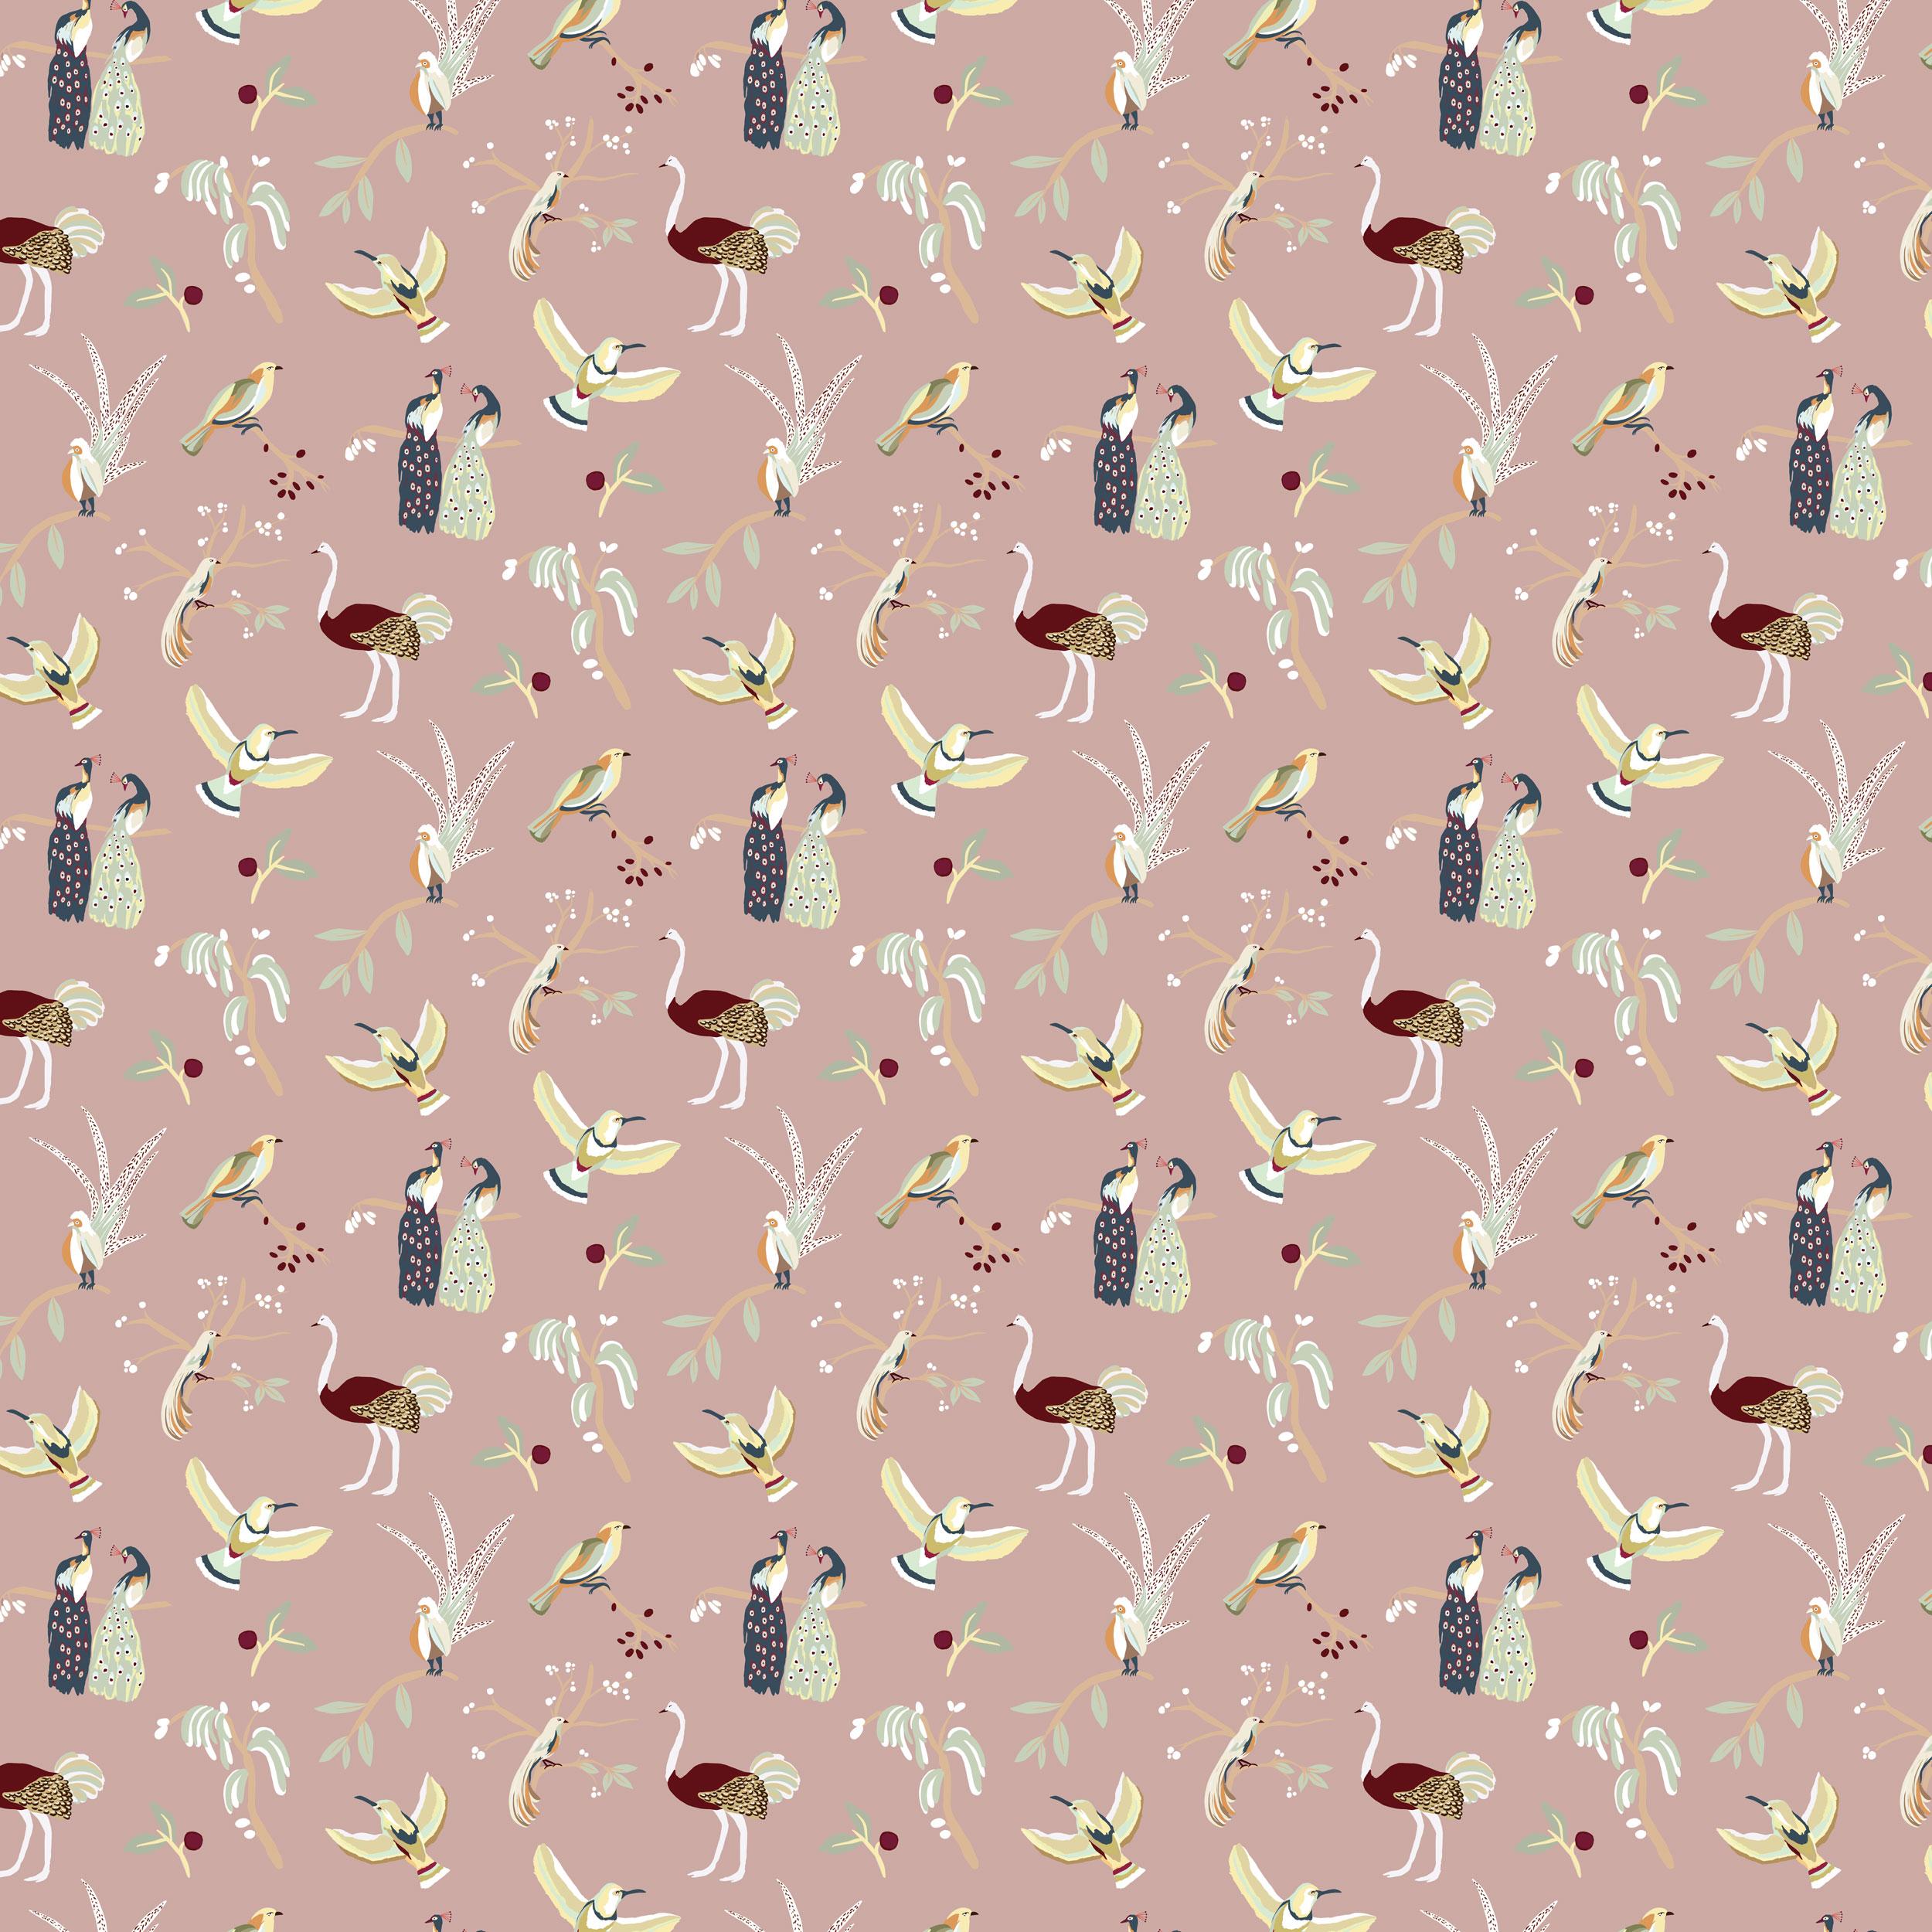 Wallpaper_Freebirds_SavedForWeb.jpg